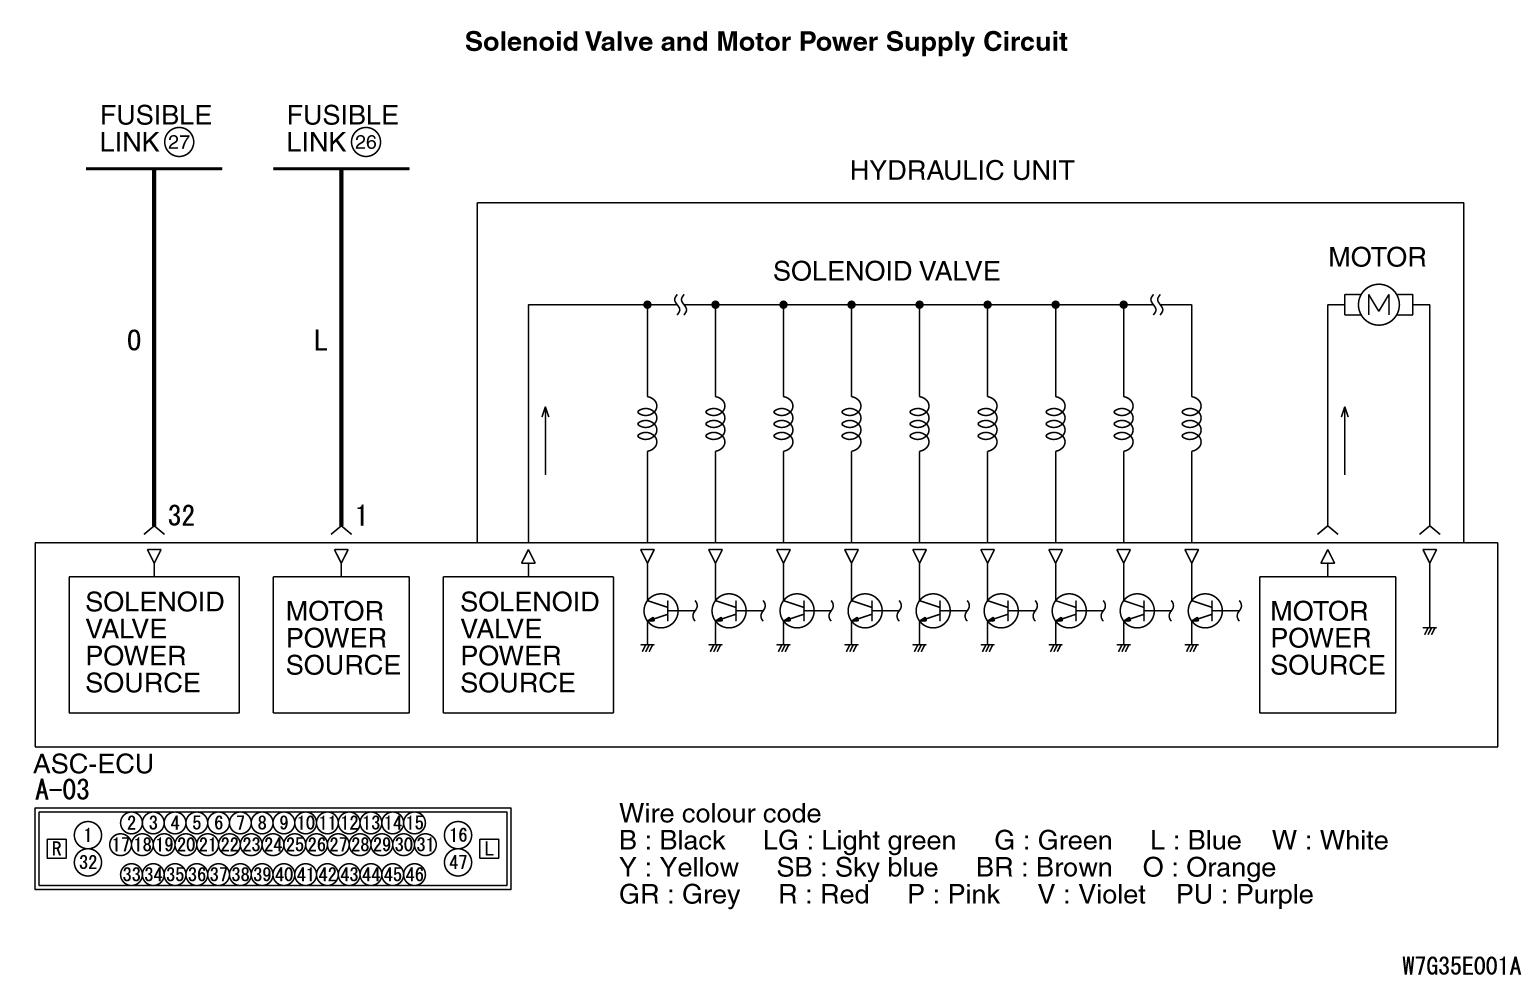 Code No  C1073 Faulty motor drive circuit